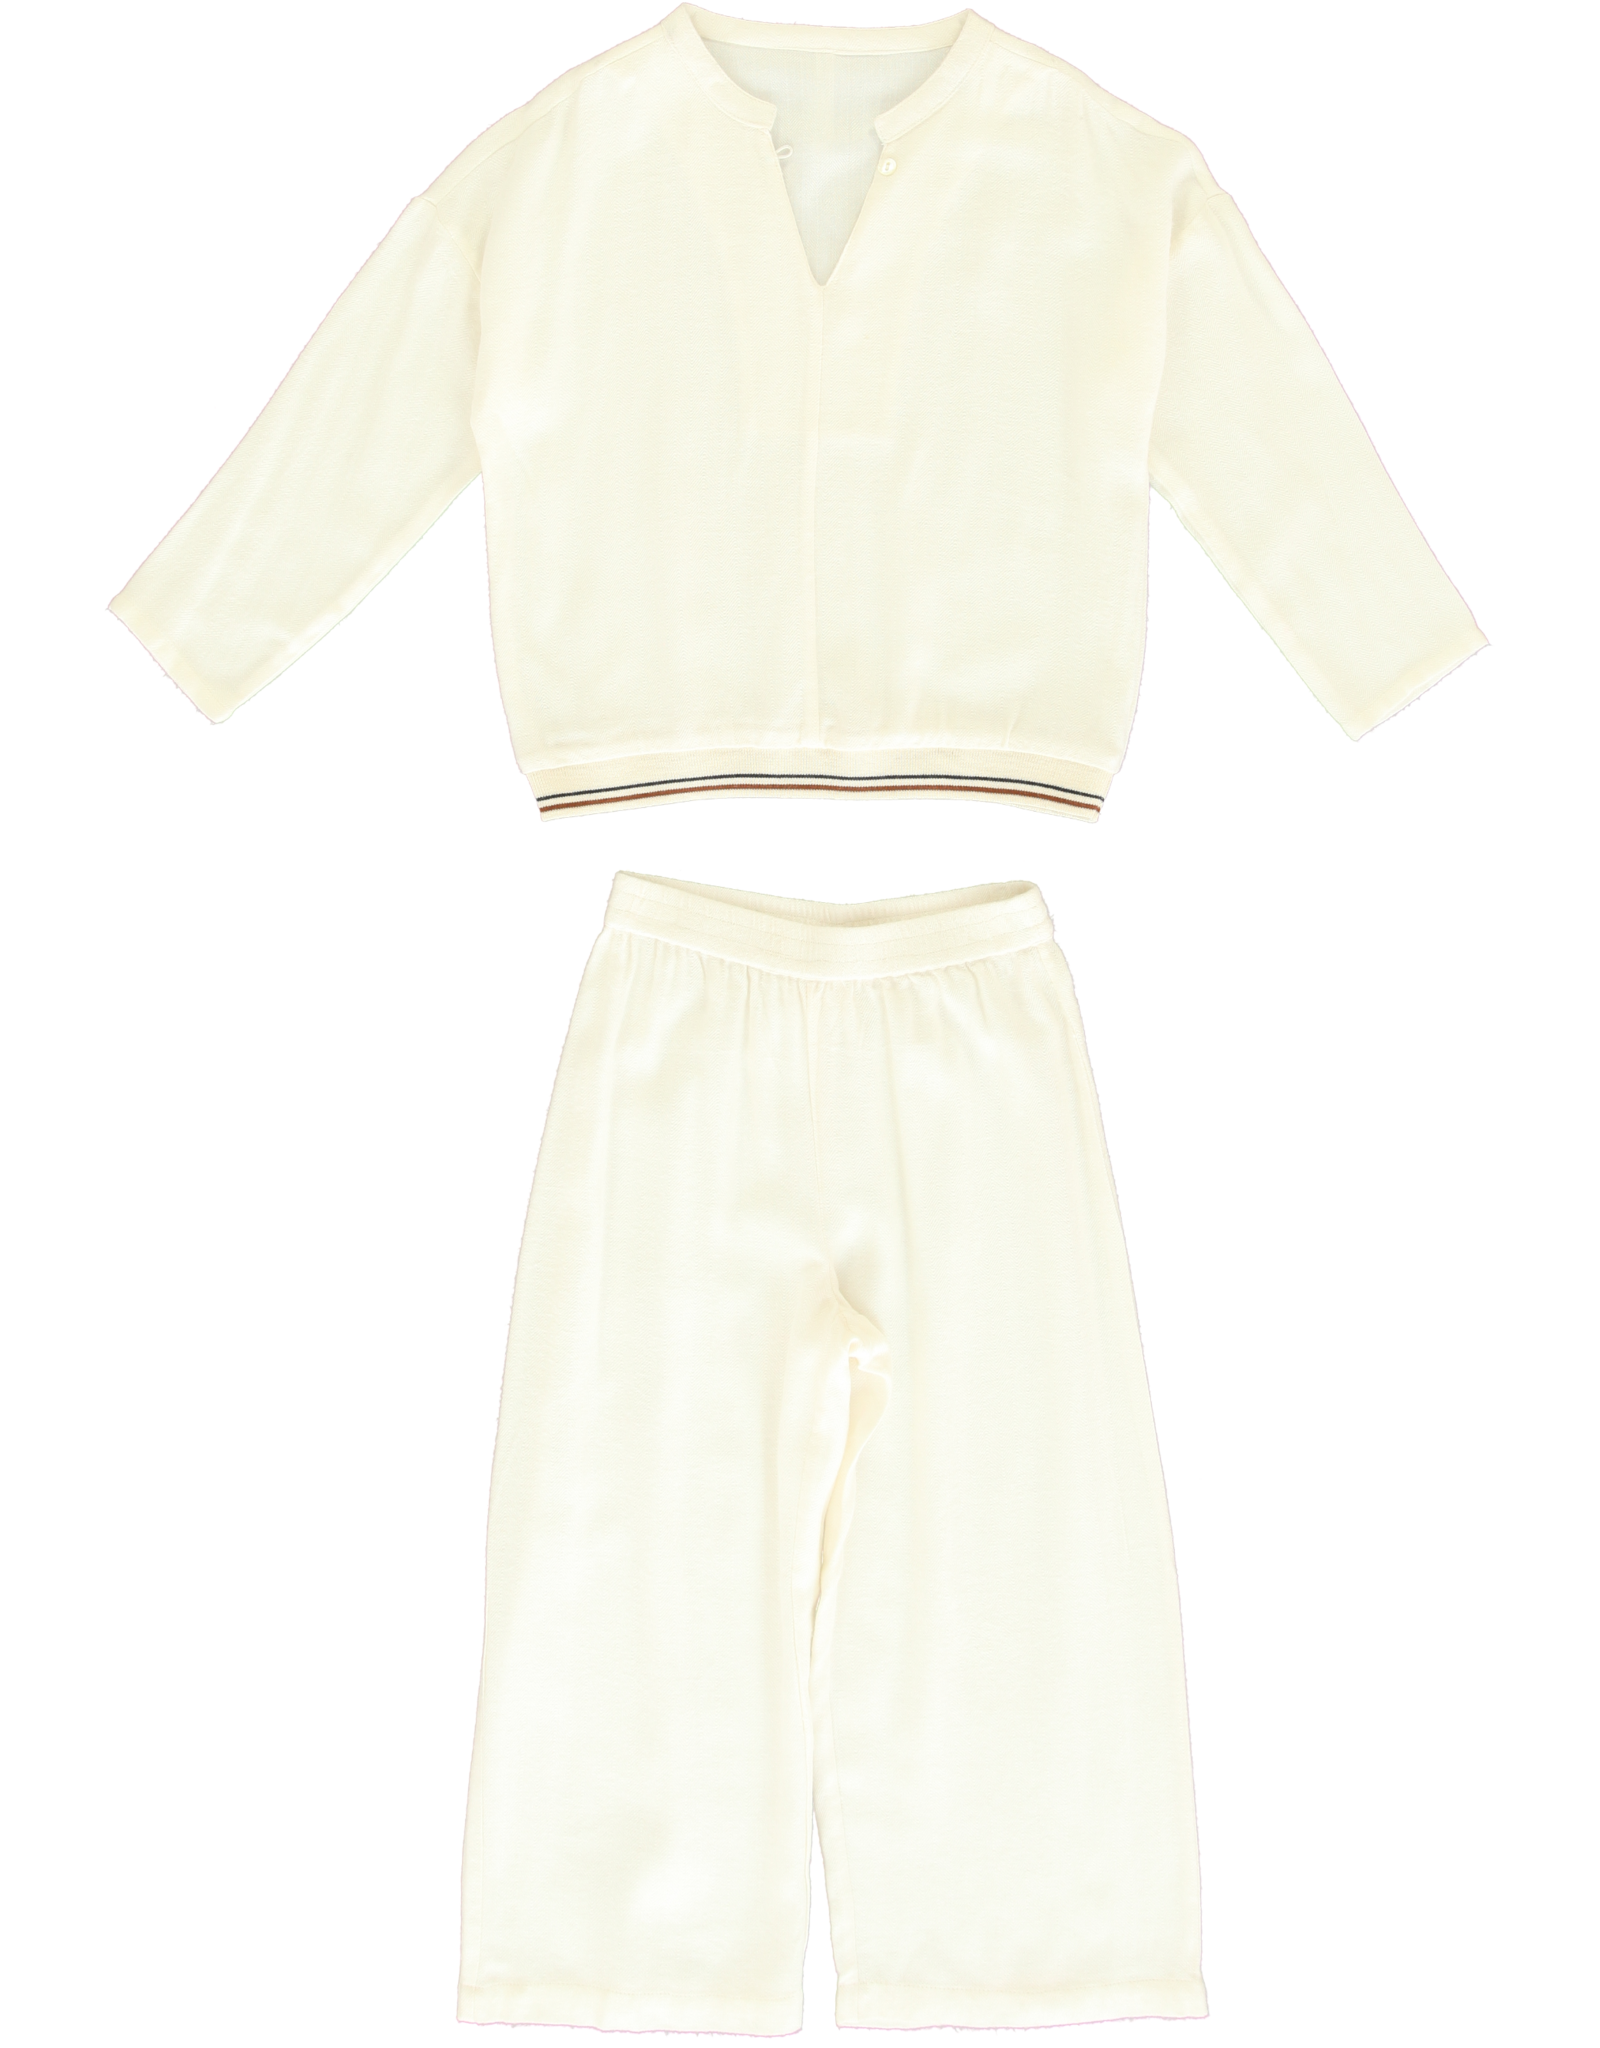 Dorélit Deline + Alkes | Pajama Set Woven | Offwhite